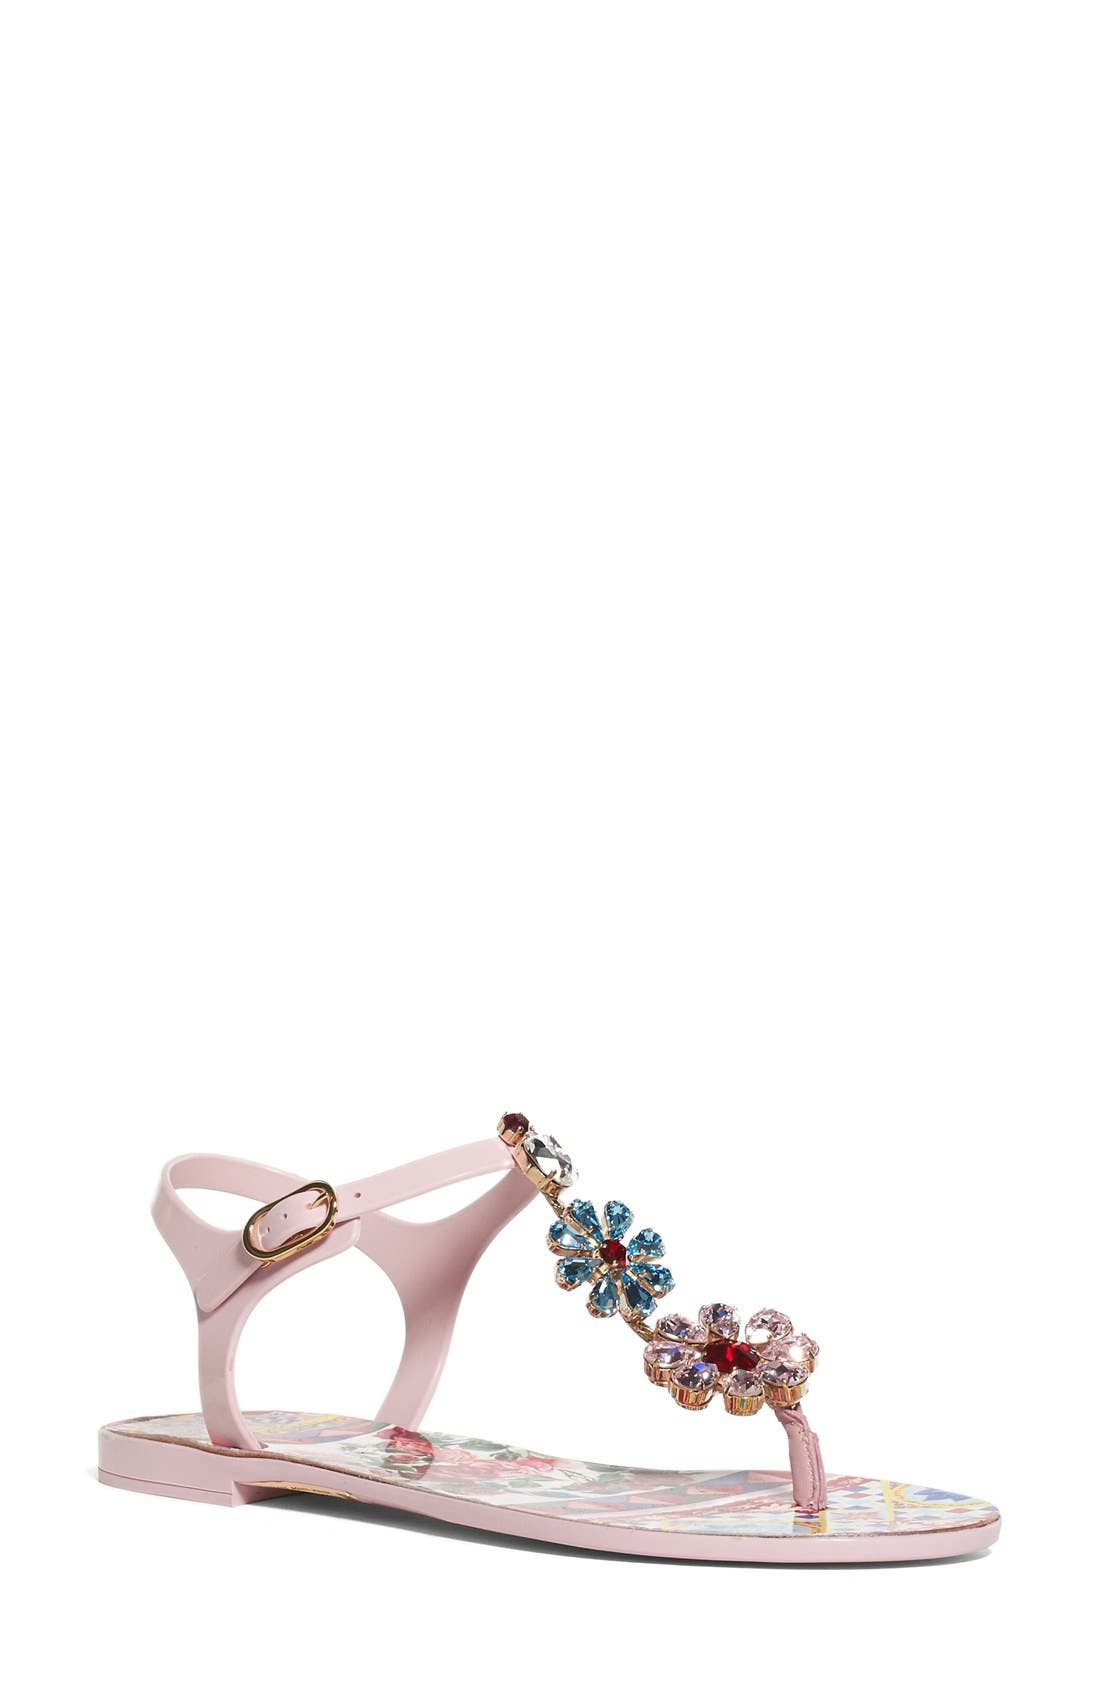 Alternate Image 1 Selected - Dolce&Gabbana Carretto Embellished Jelly Sandal (Women)